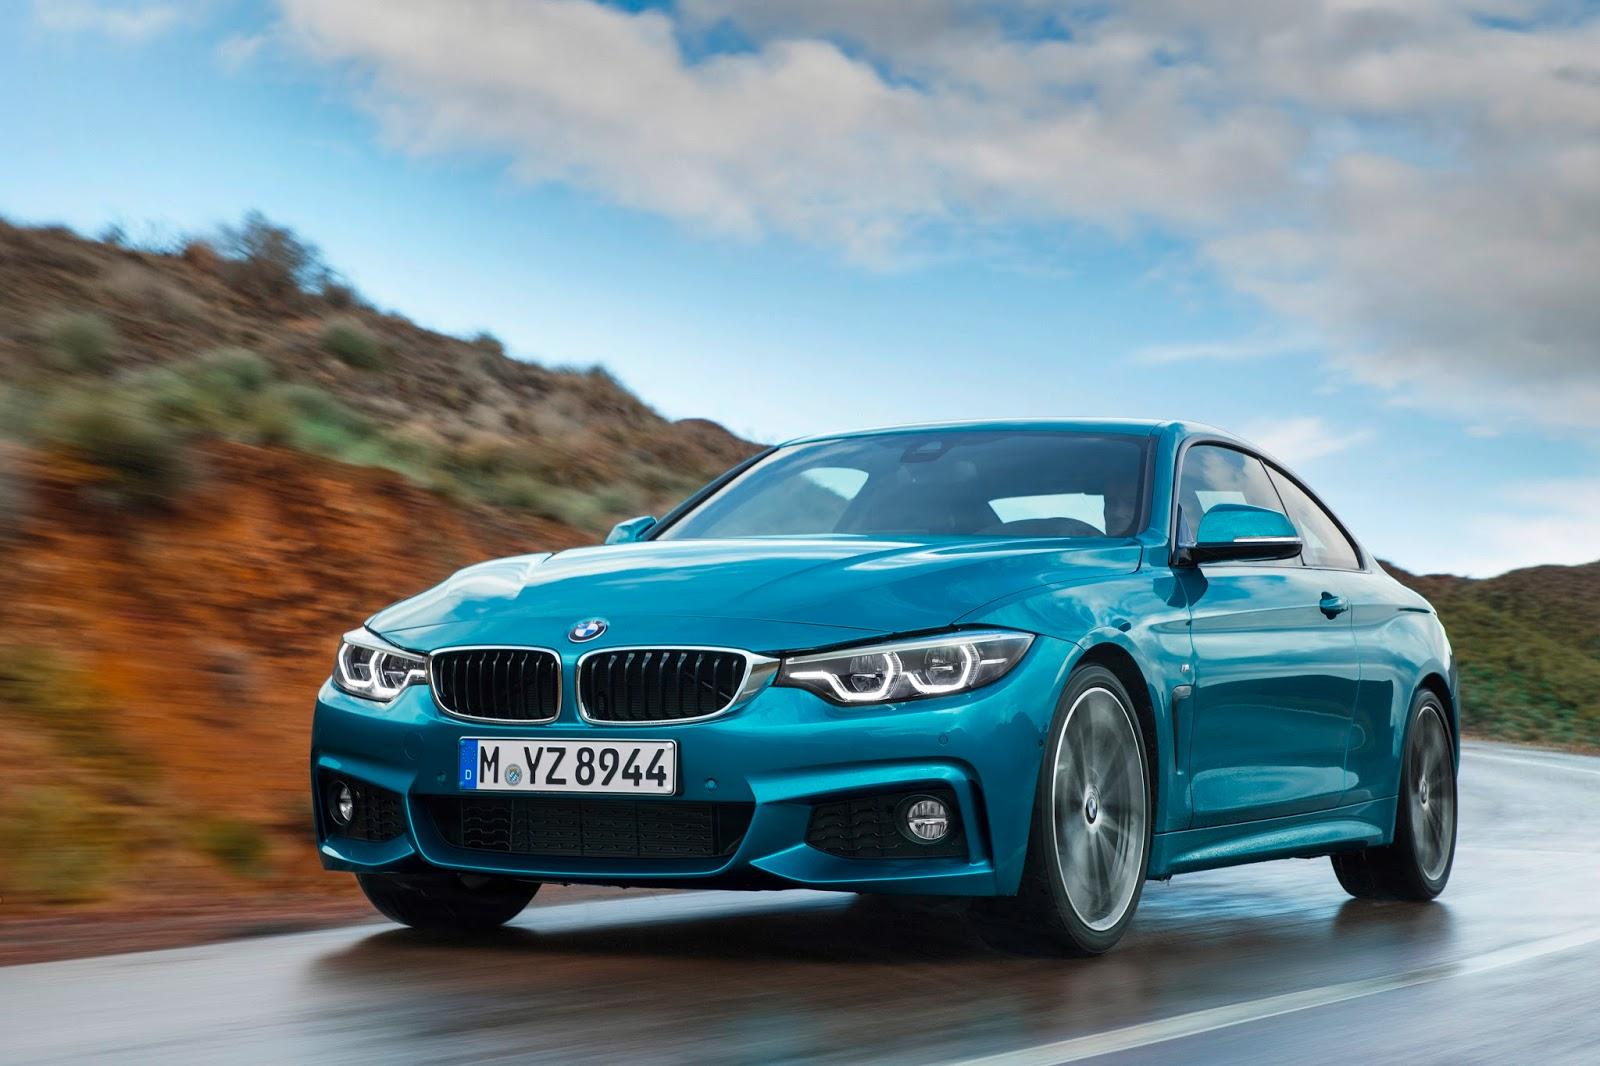 P90245224 highRes bmw 4 series m sport Η νέα BMW Σειρά 4, με πιο σφιχτή ρύθμιση ανάρτησης BMW, Bmw 4, BMW 4 Cabrio, BMW 4 Coupe, BMW 4 Gran Coupé, Facelift